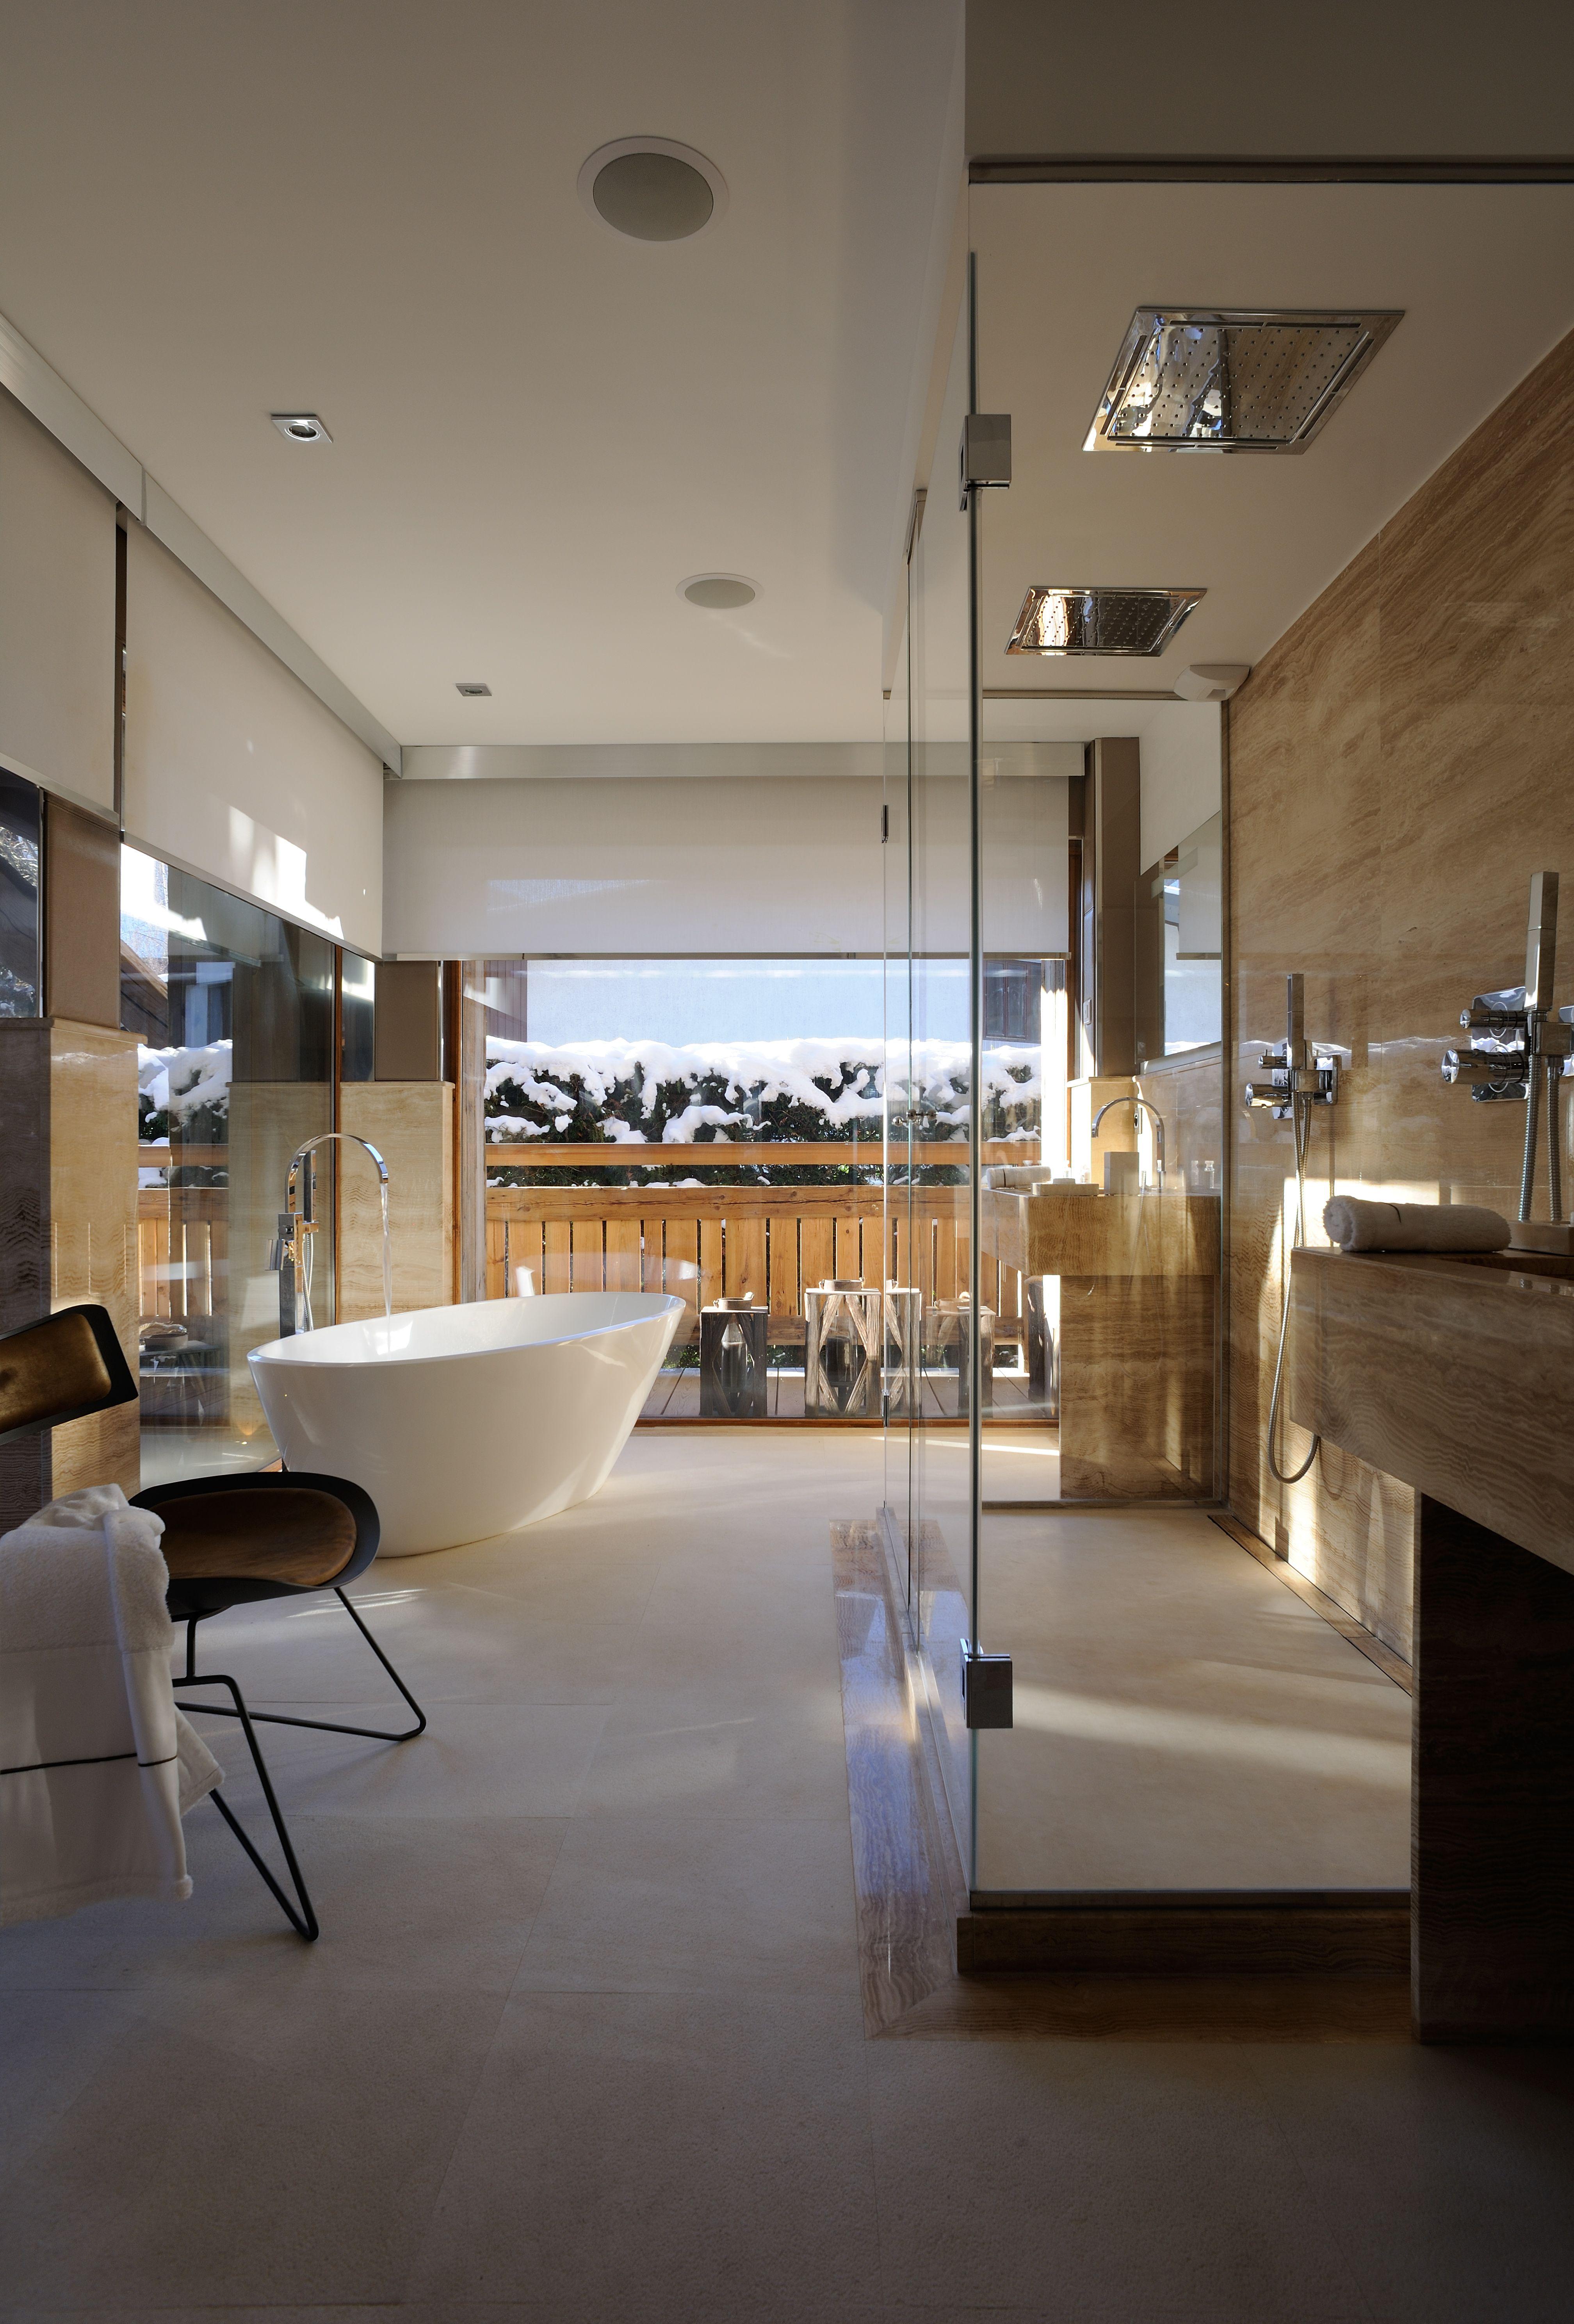 Marbre fossilis salle de bain luxueuse salle de bain - Radio de salle de bain design ...